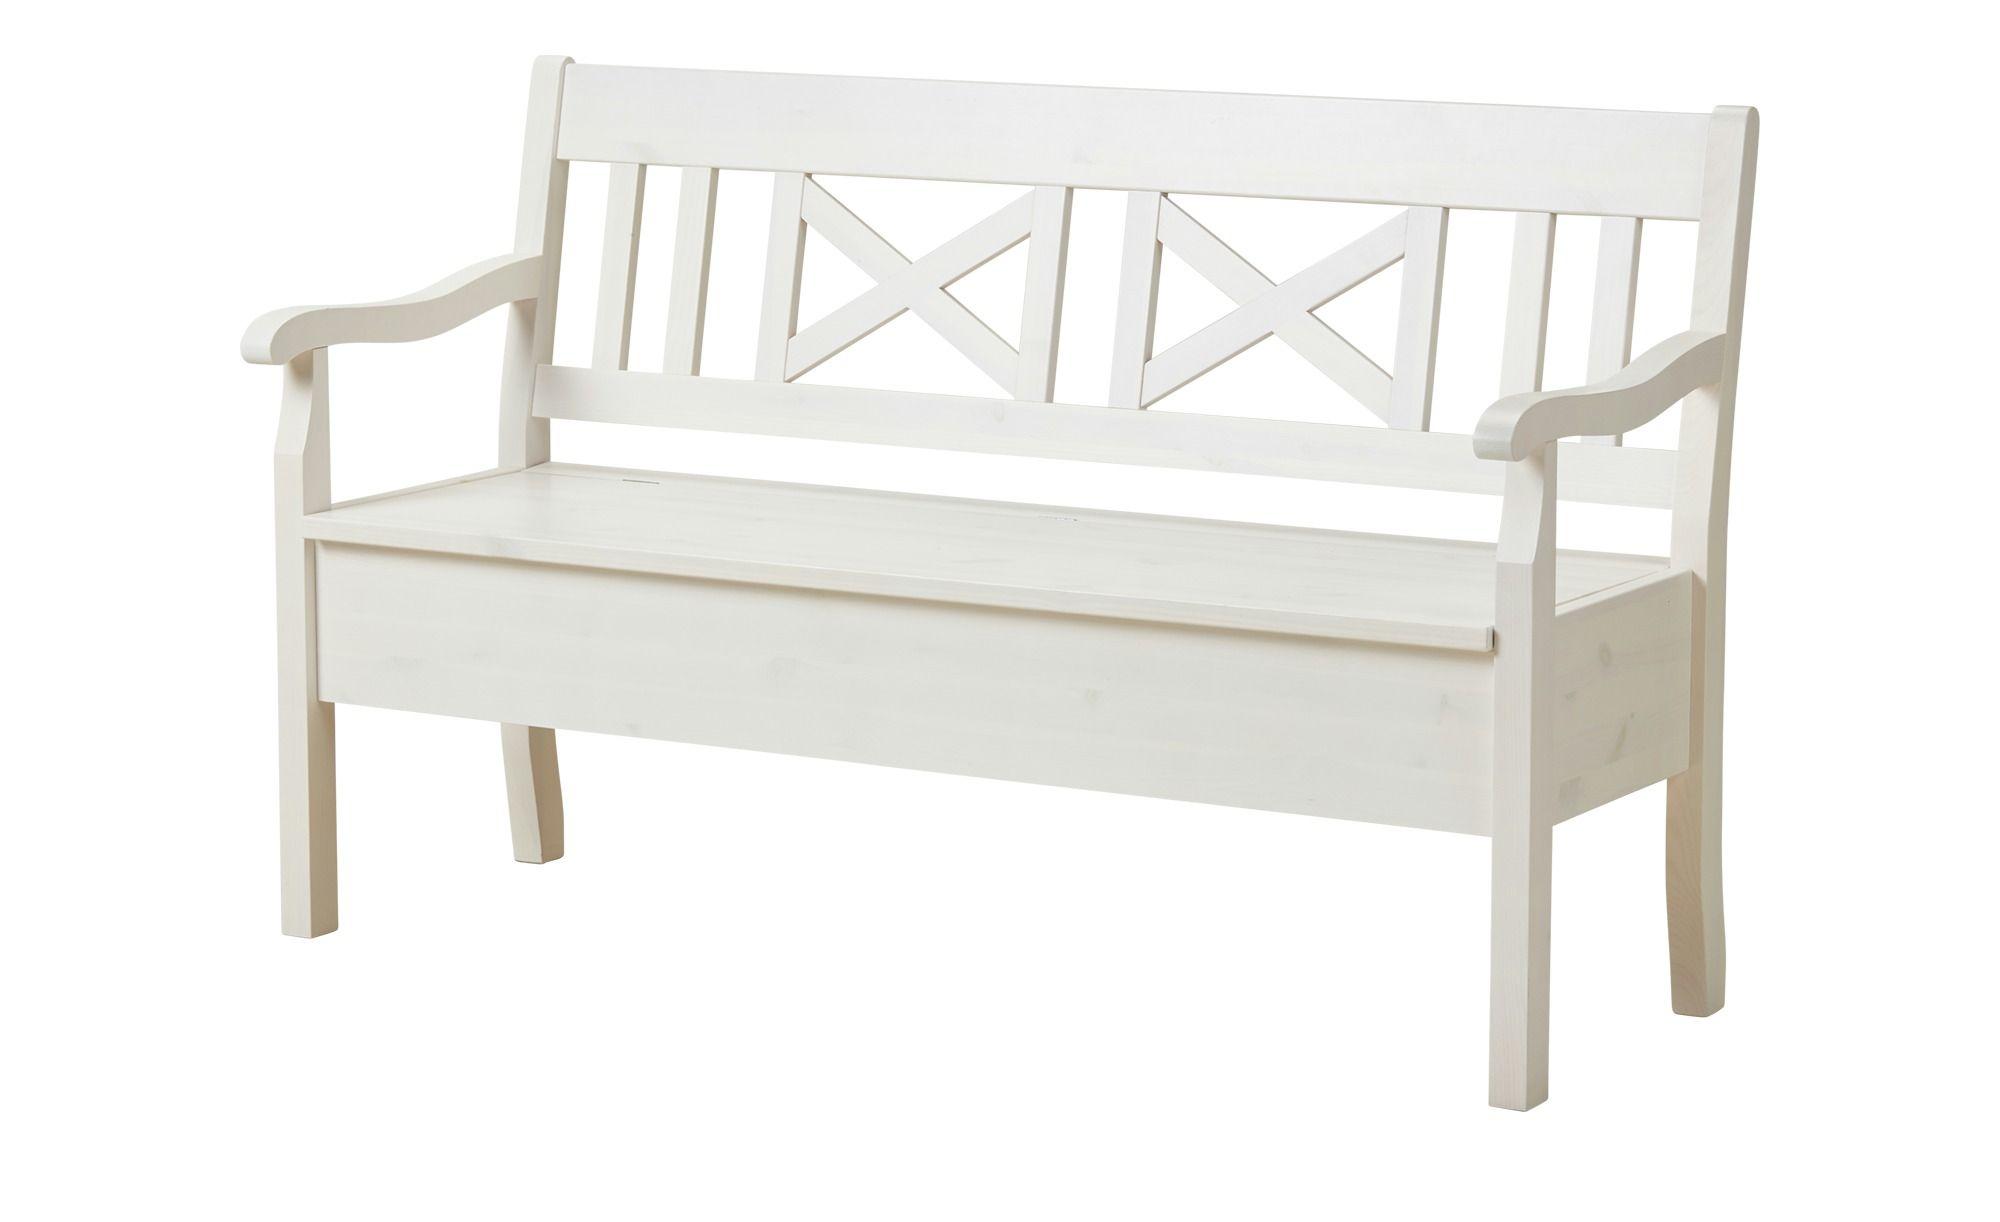 v ce ne 25 nejlep ch n pad na pinterestu na t ma. Black Bedroom Furniture Sets. Home Design Ideas